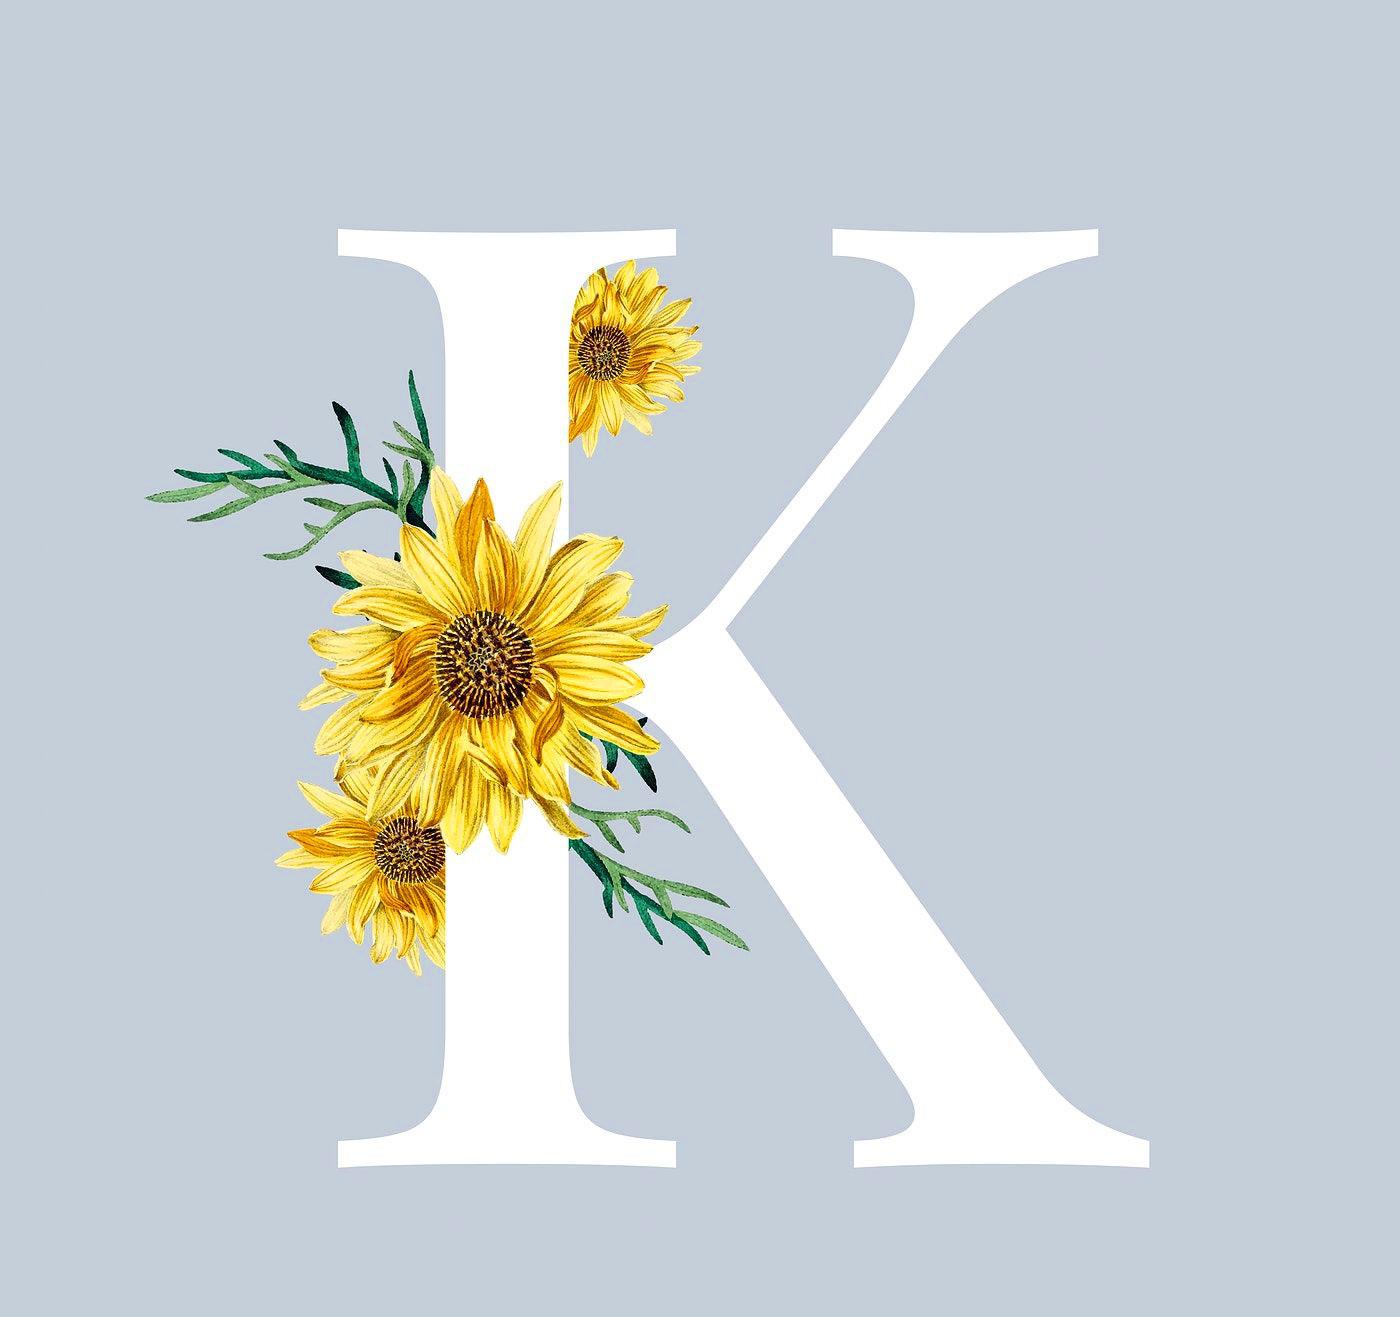 Stylish K Name Dp Images wallpaper free hd